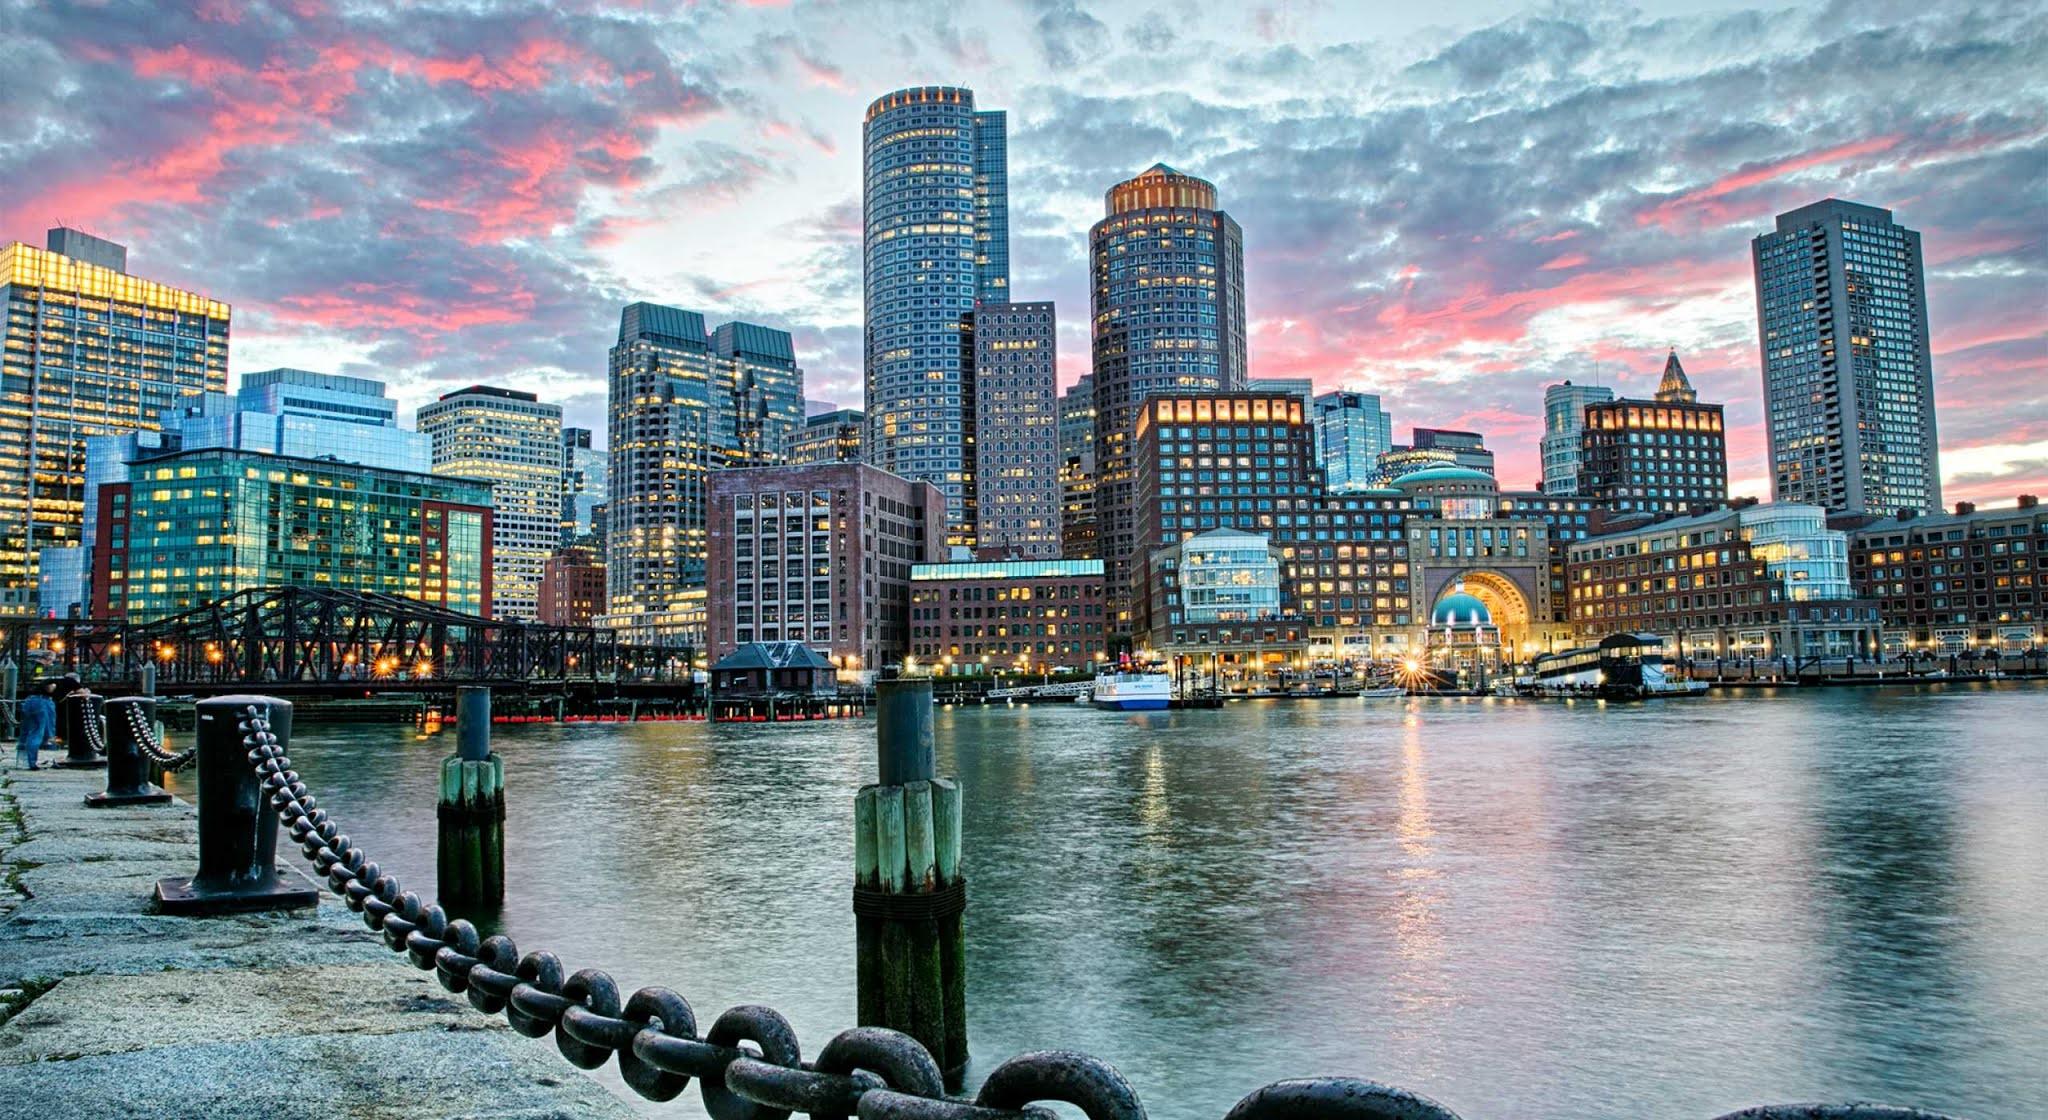 Top 6 tourist attractions in Boston